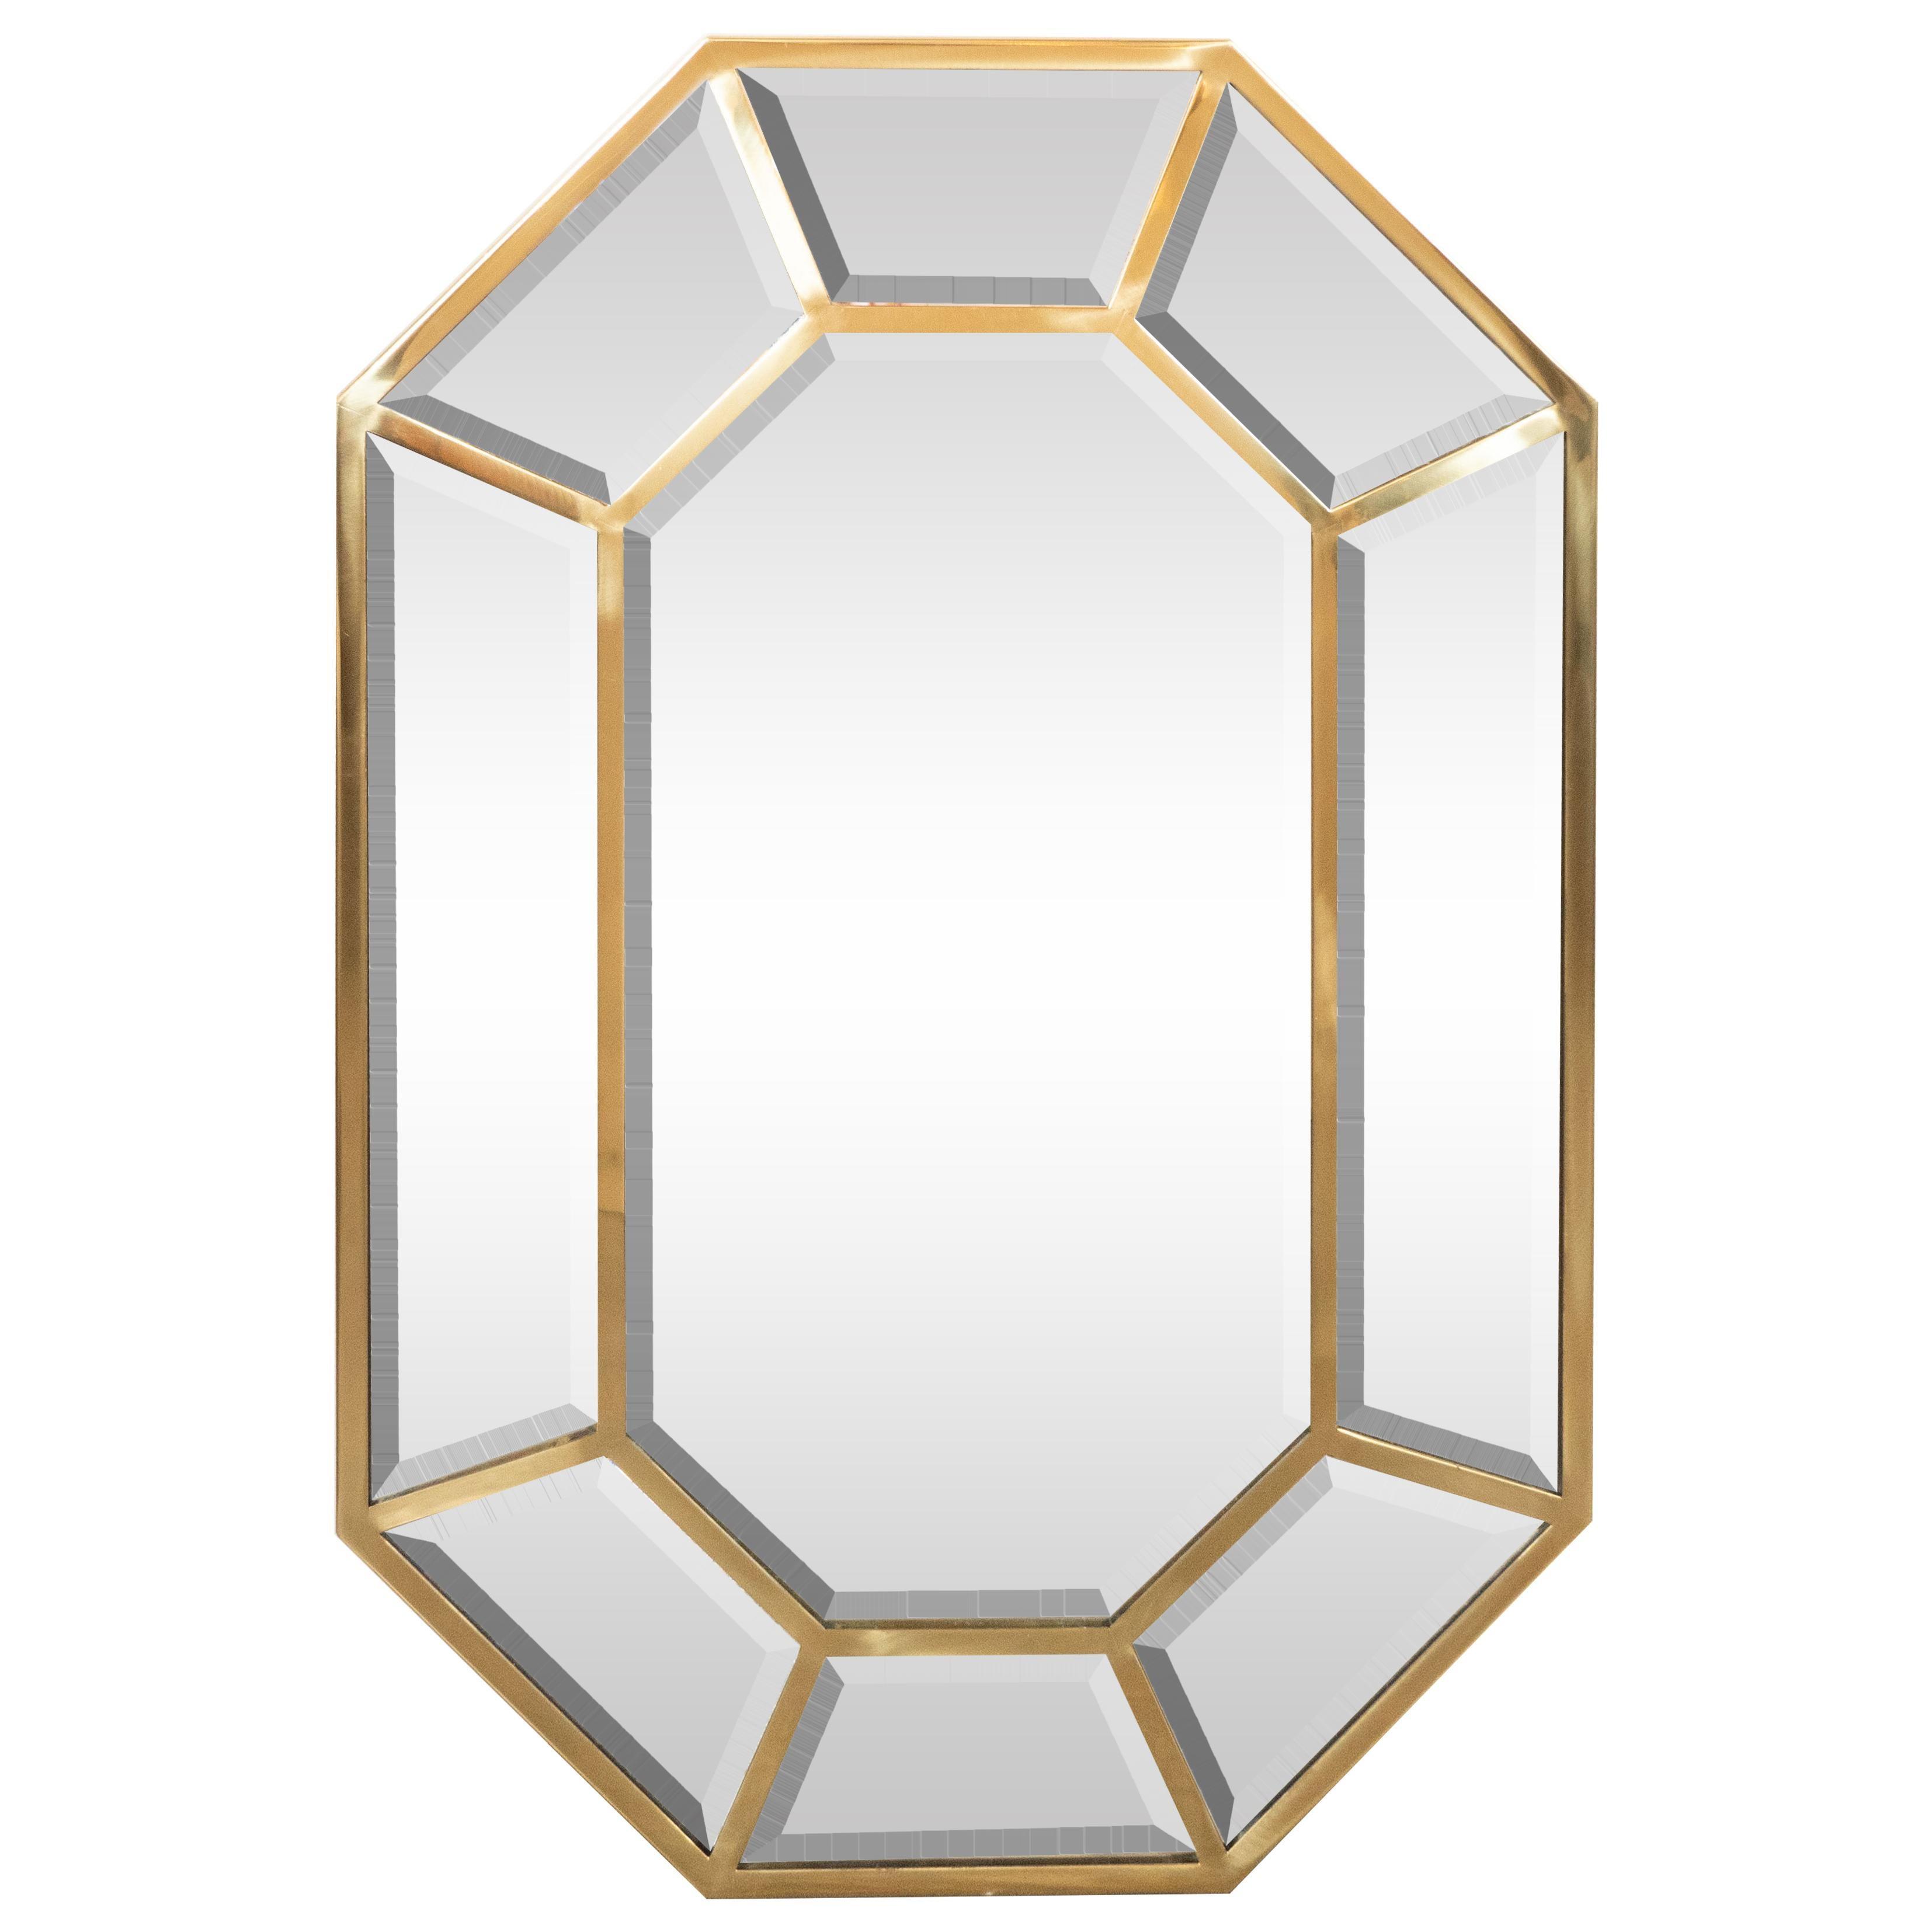 Mid-Century Modern Segmented Octagonal Polished Brass Mirror